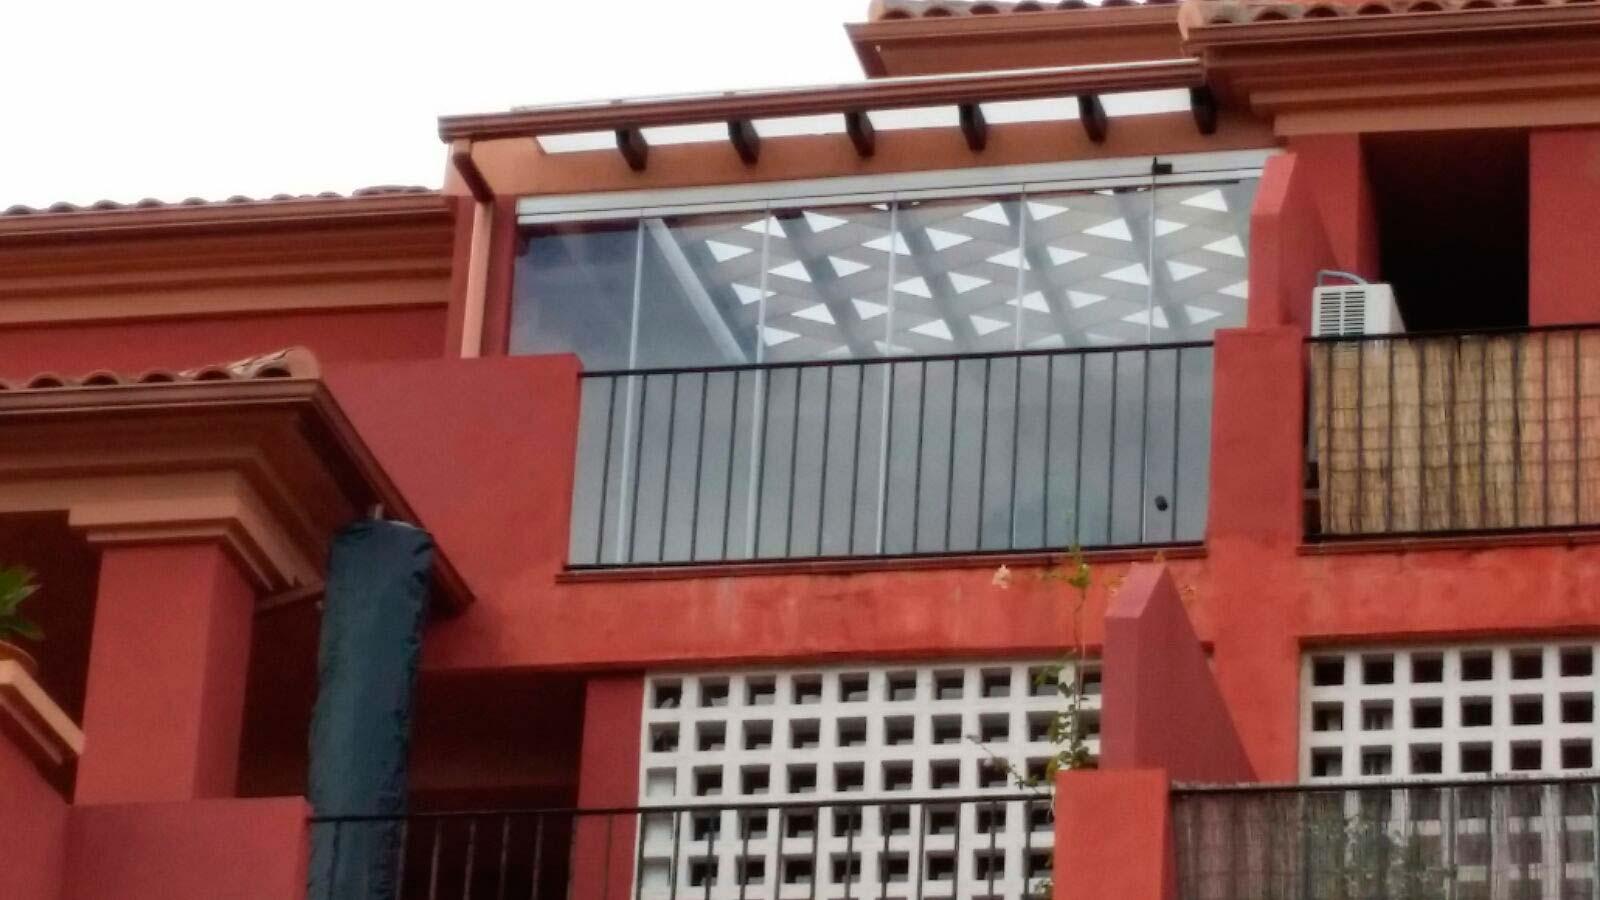 Cortinas de cristal malaga interesting cortinas de - Cortinas de cristal malaga ...